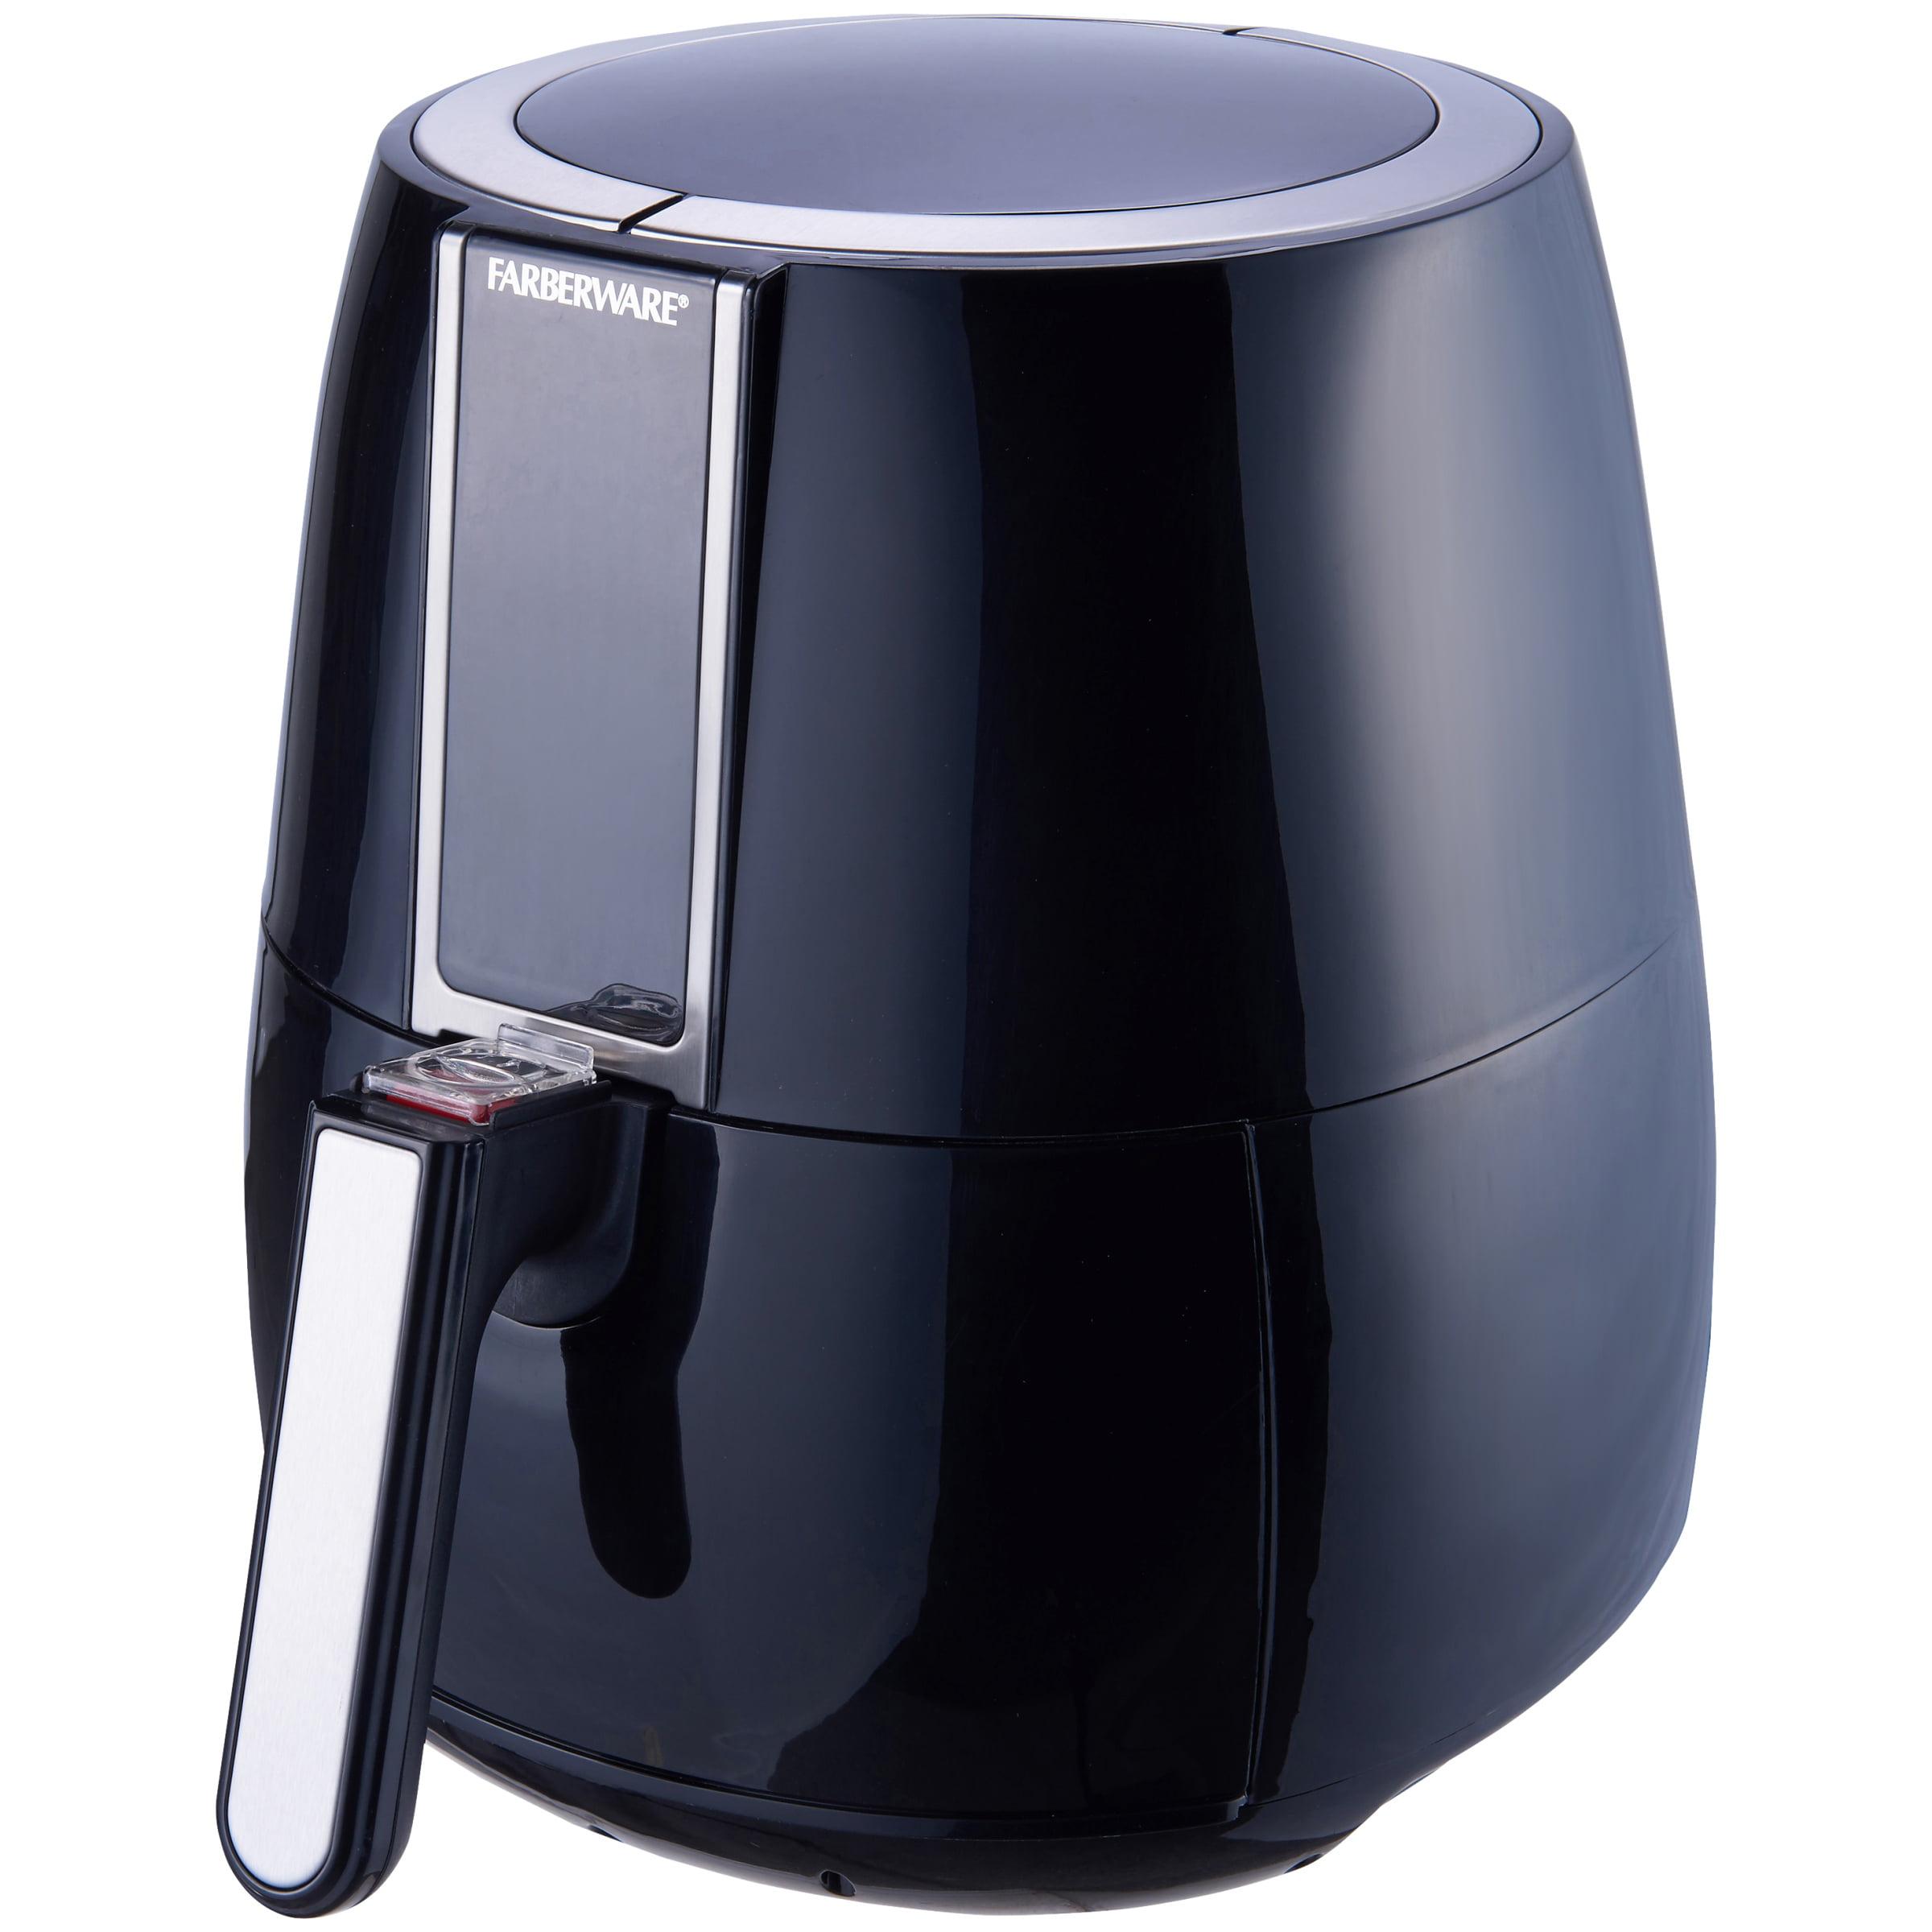 Farberware 3 Liter Digital Oil-Less Fryer, Black